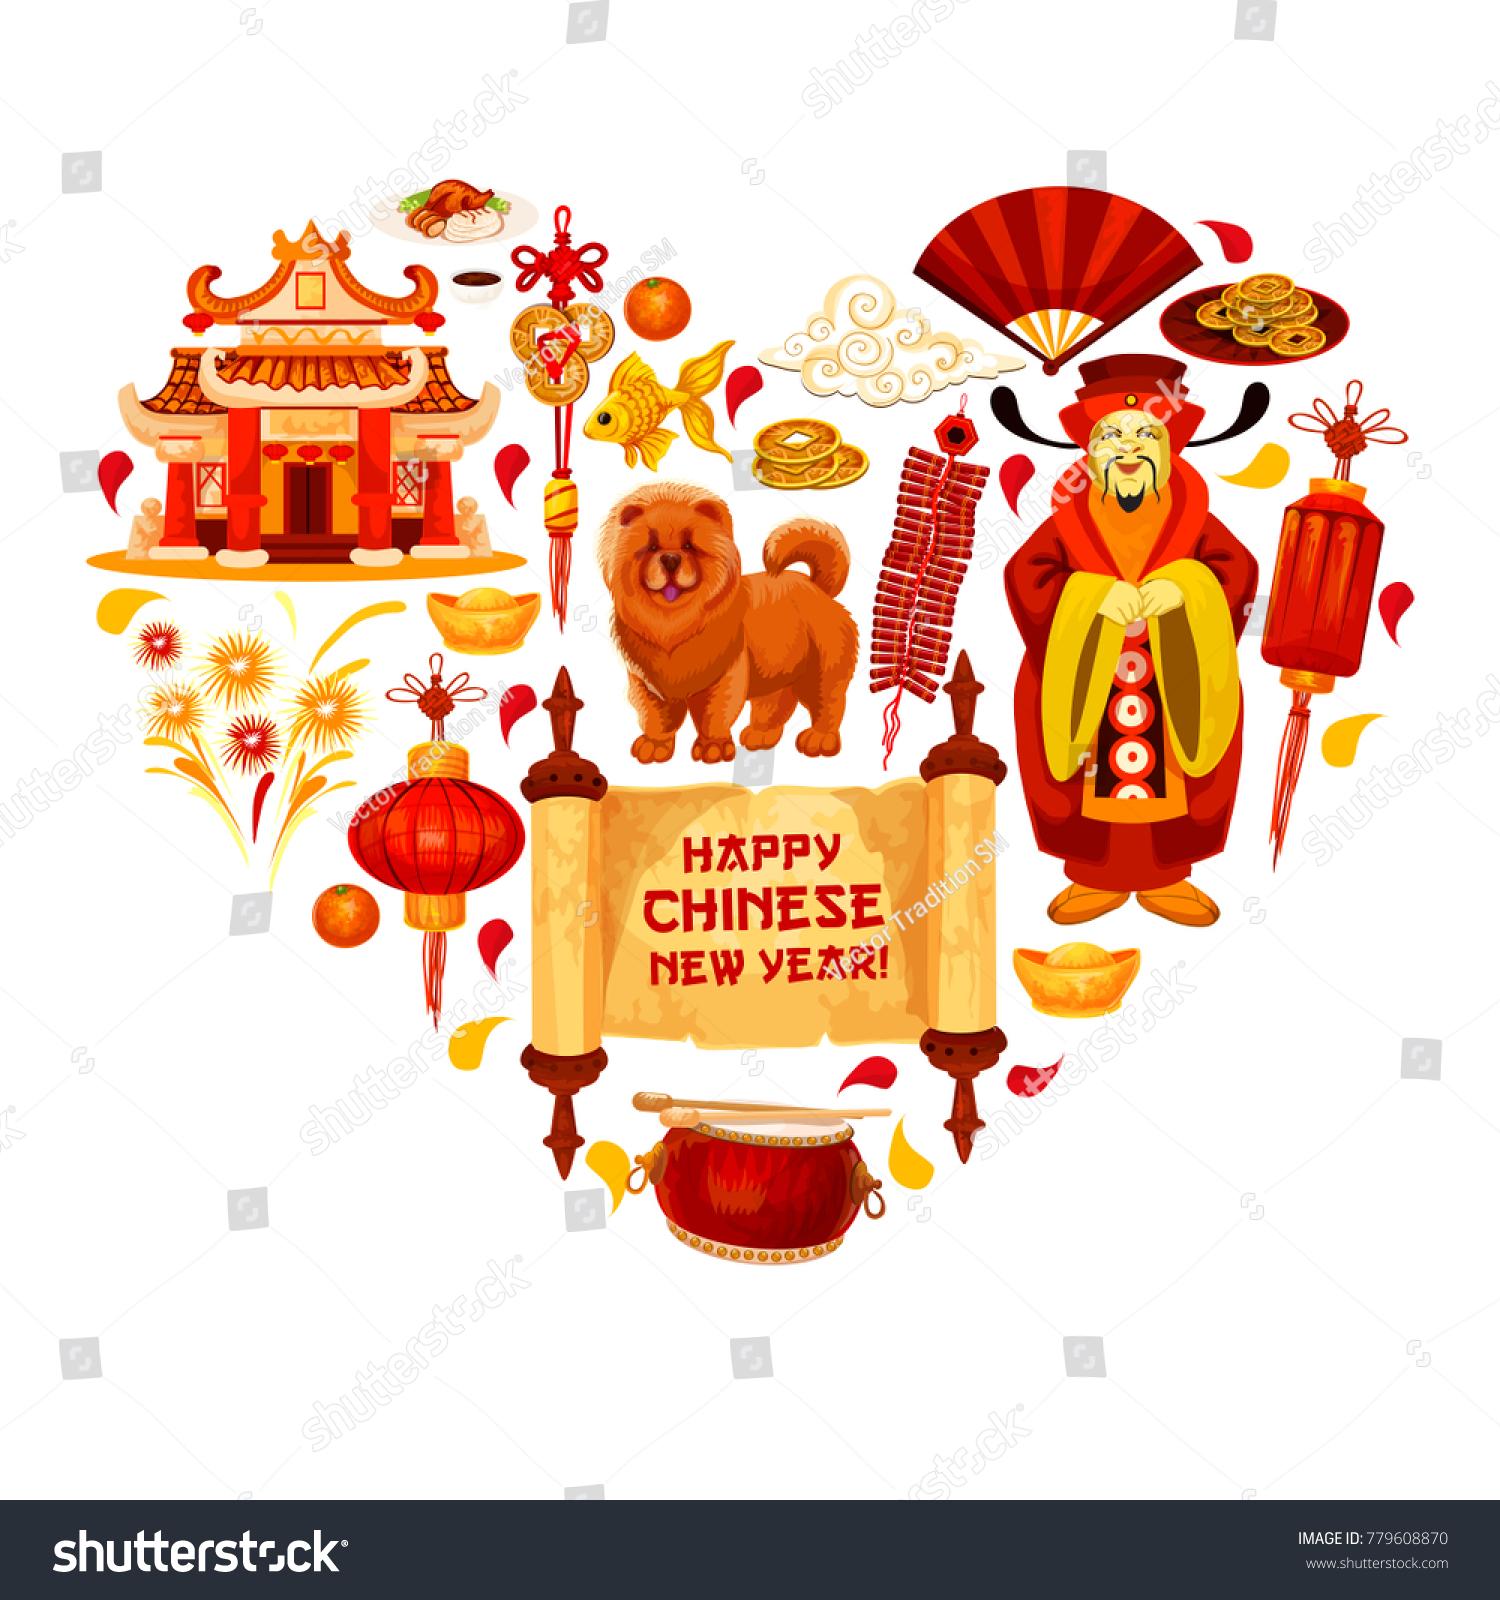 Happy Chinese New Year Wish Hieroglyph Stock Vector Royalty Free